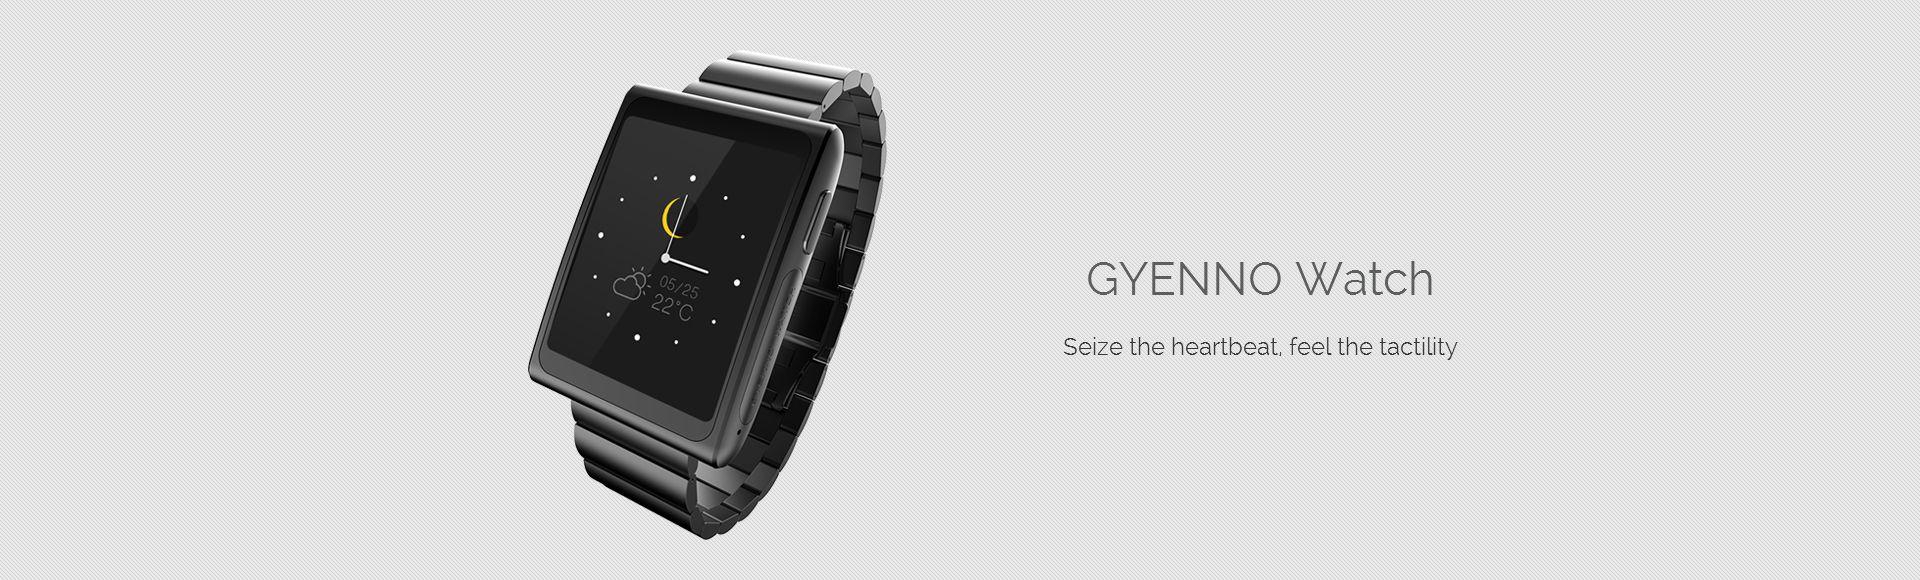 GYENNO Watch